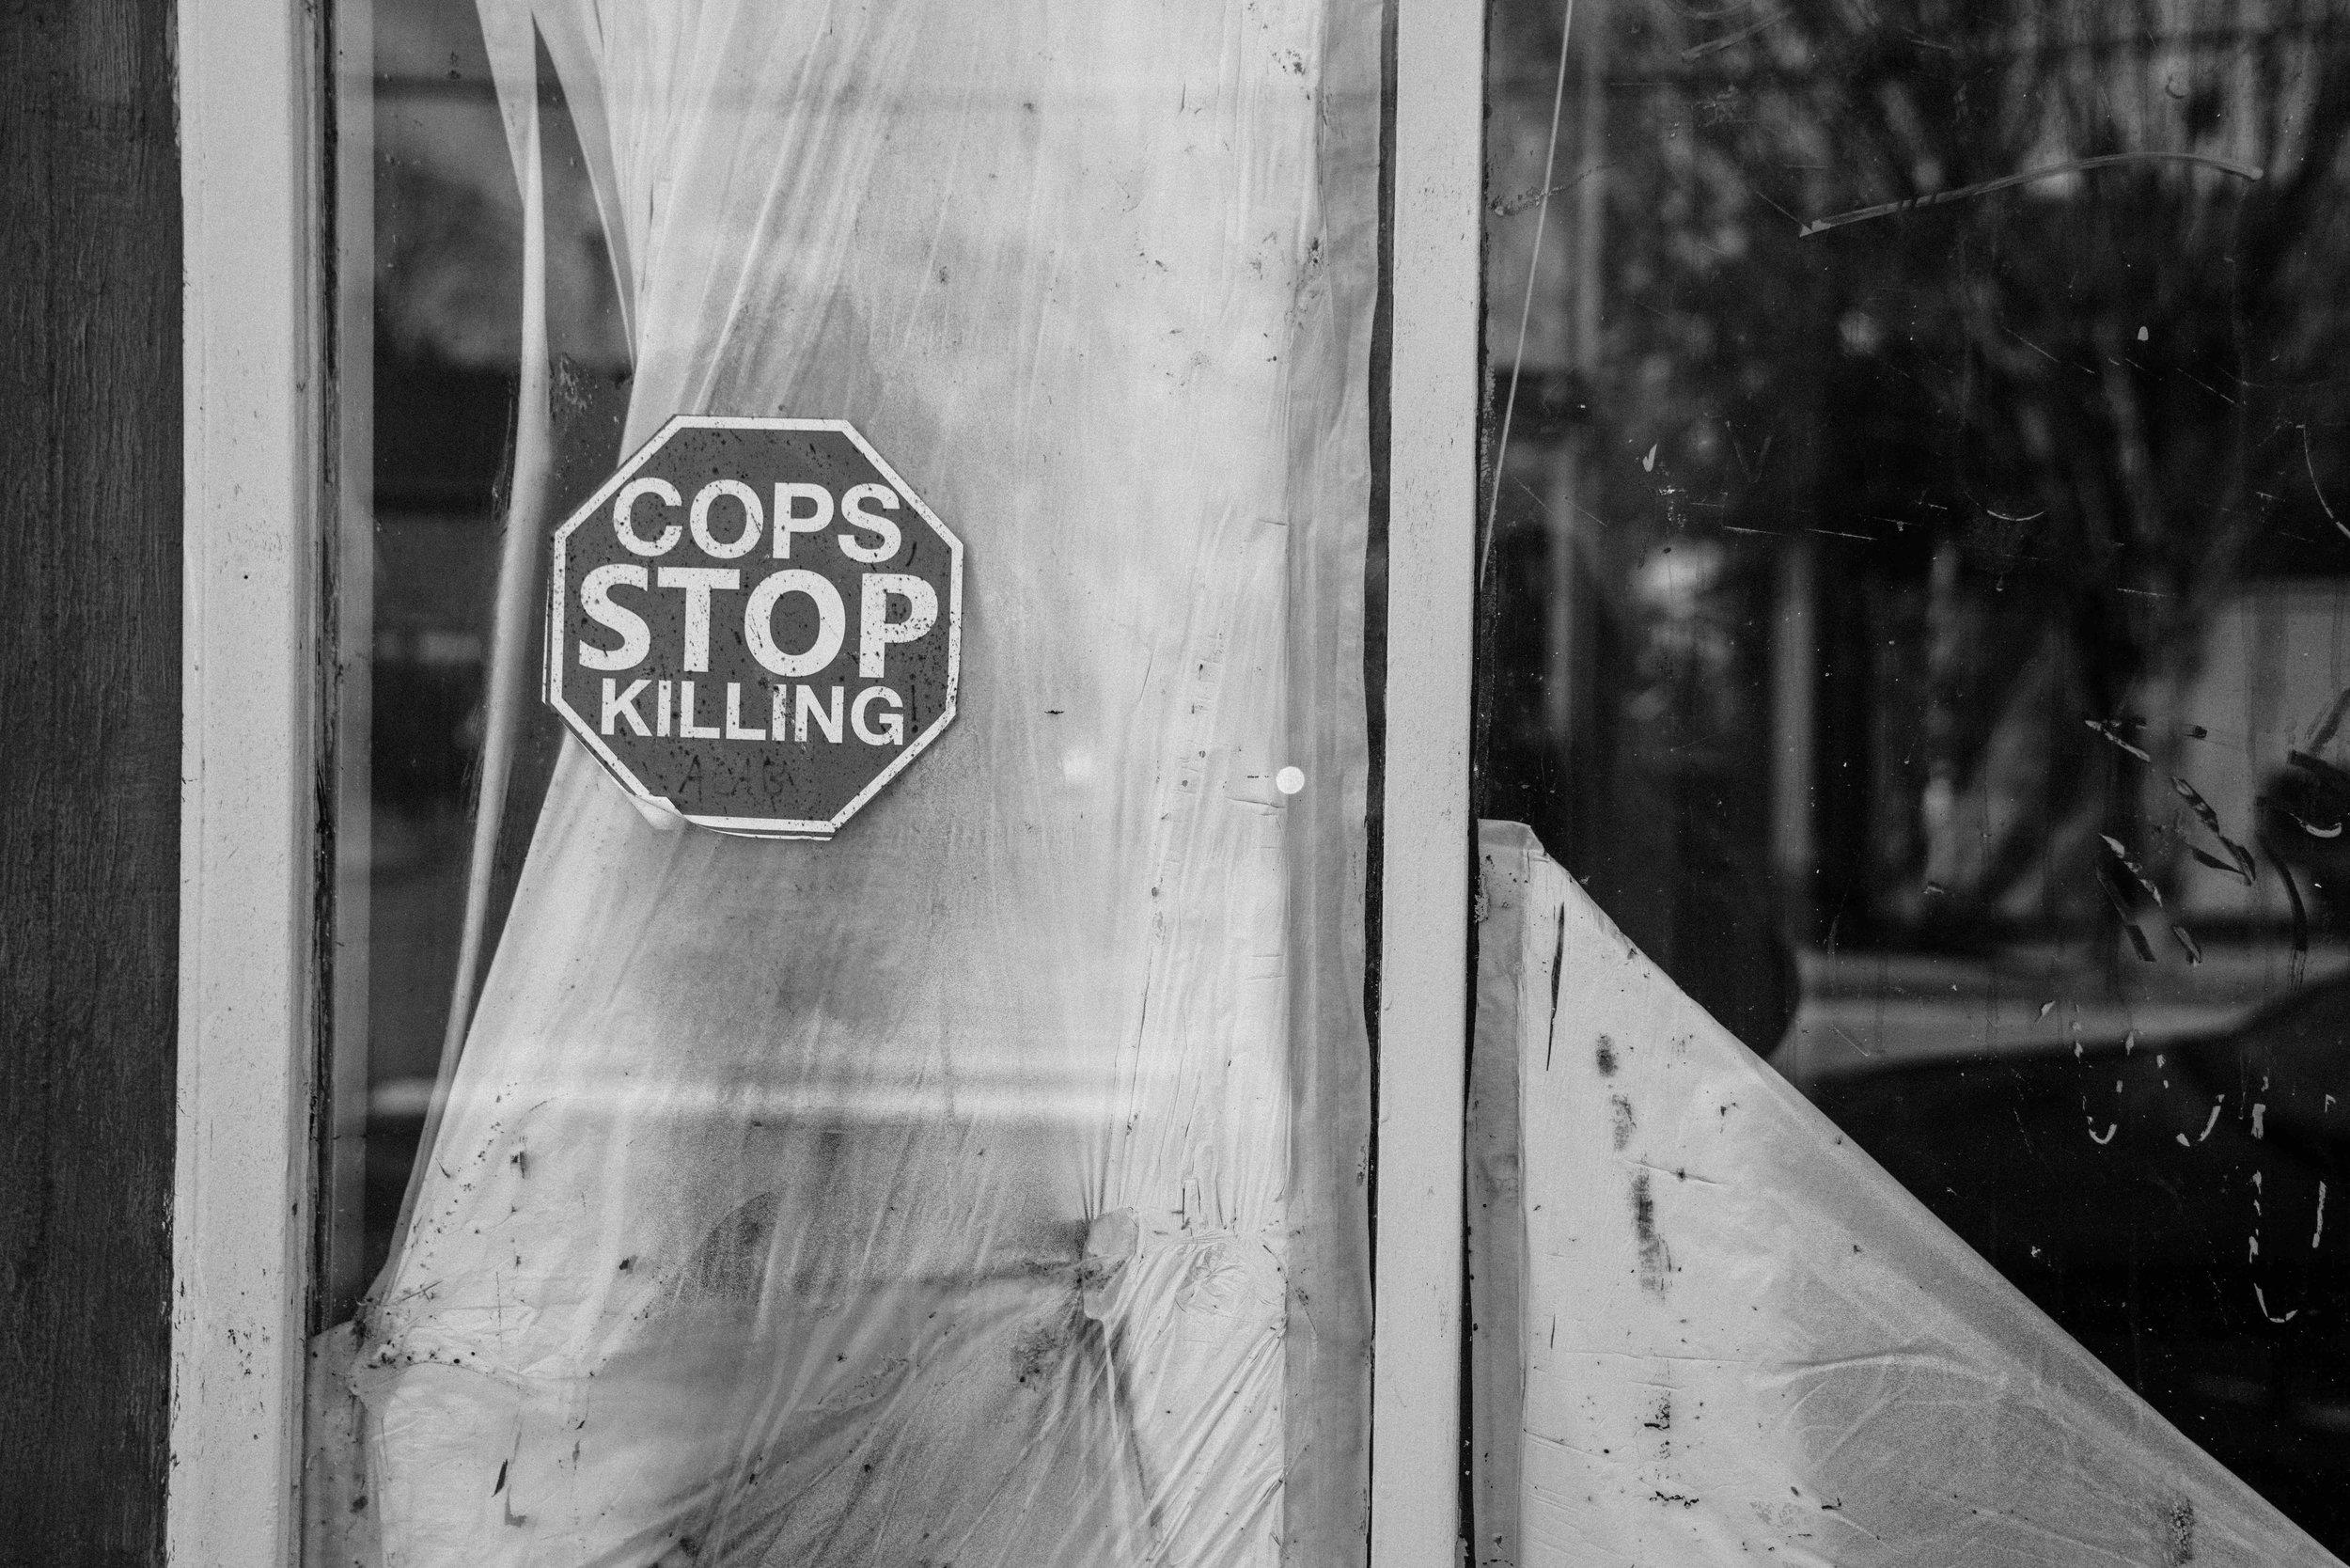 josue-rivas-cops-stop-killing-portland-oregon.jpg